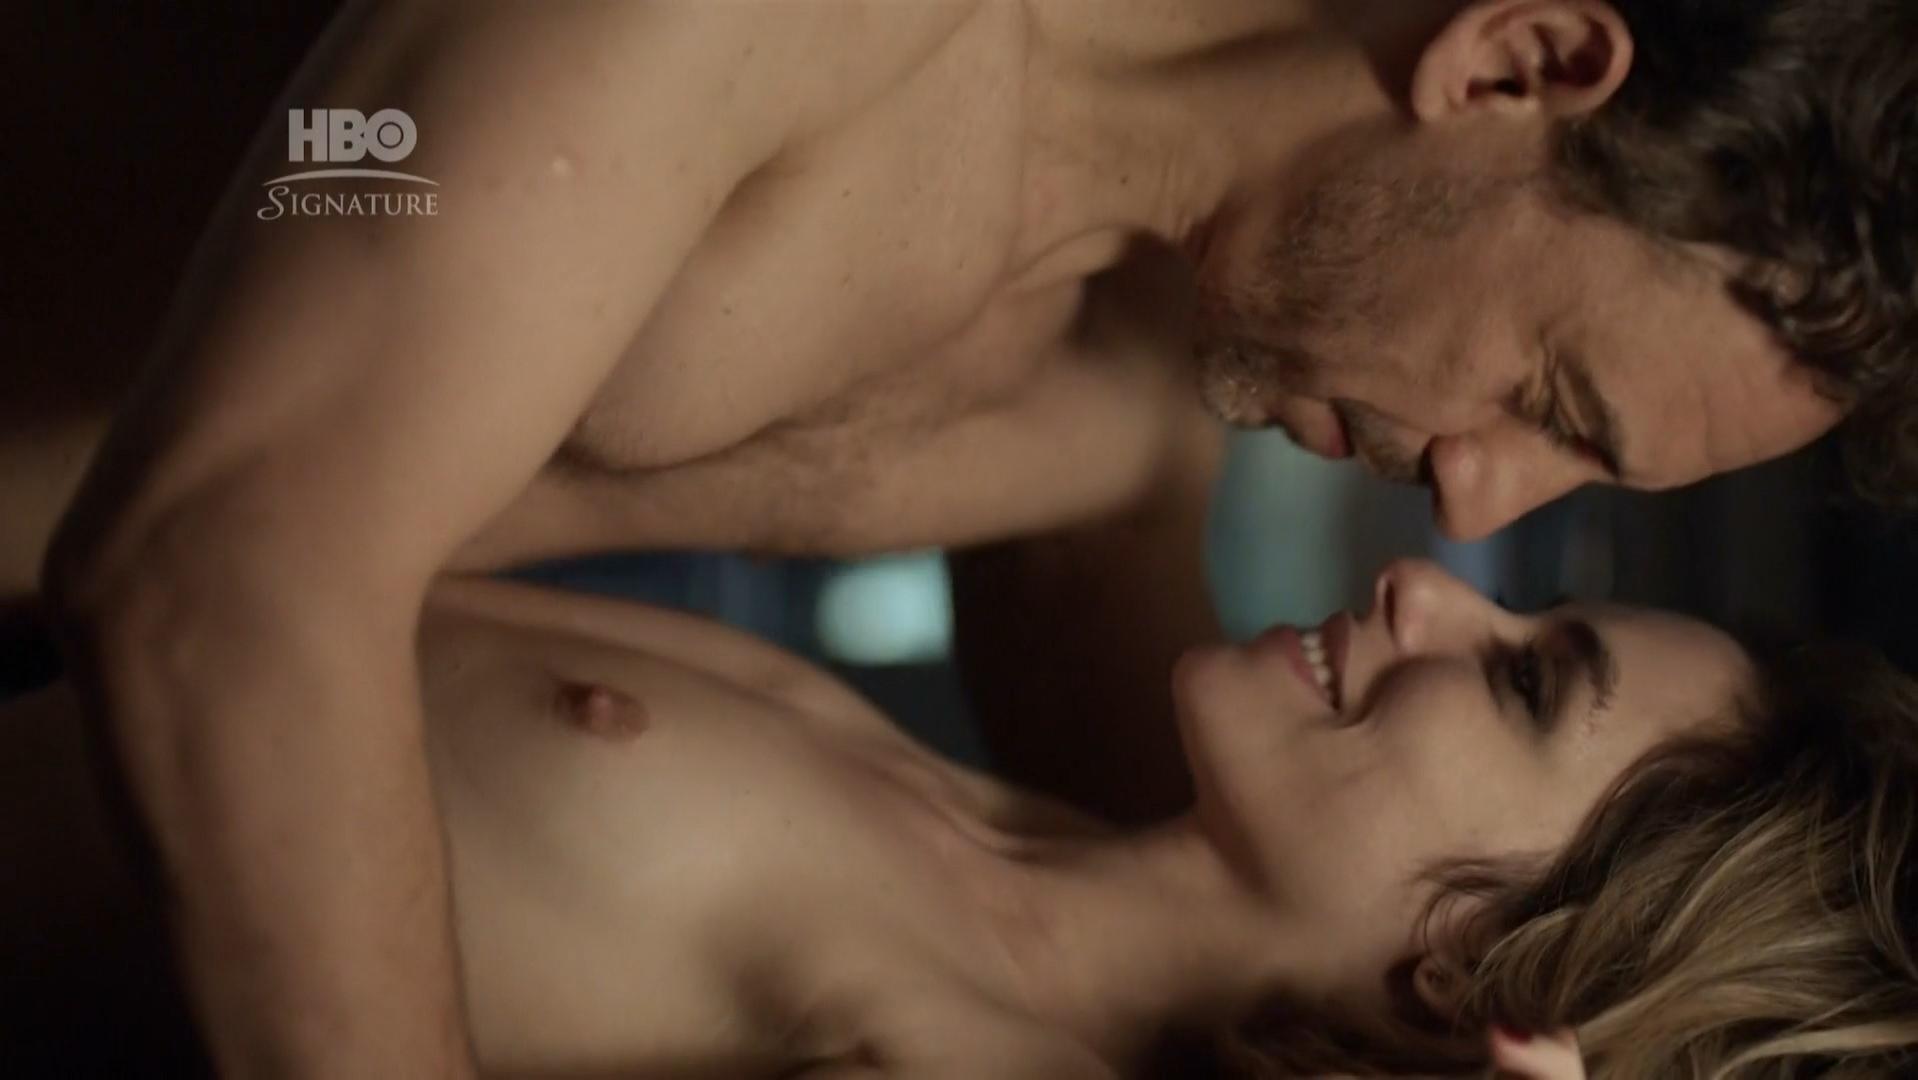 Claudia Ohana nude, Julia Ianina nude, Simone Iliescu nude - Psi s01 (2014)